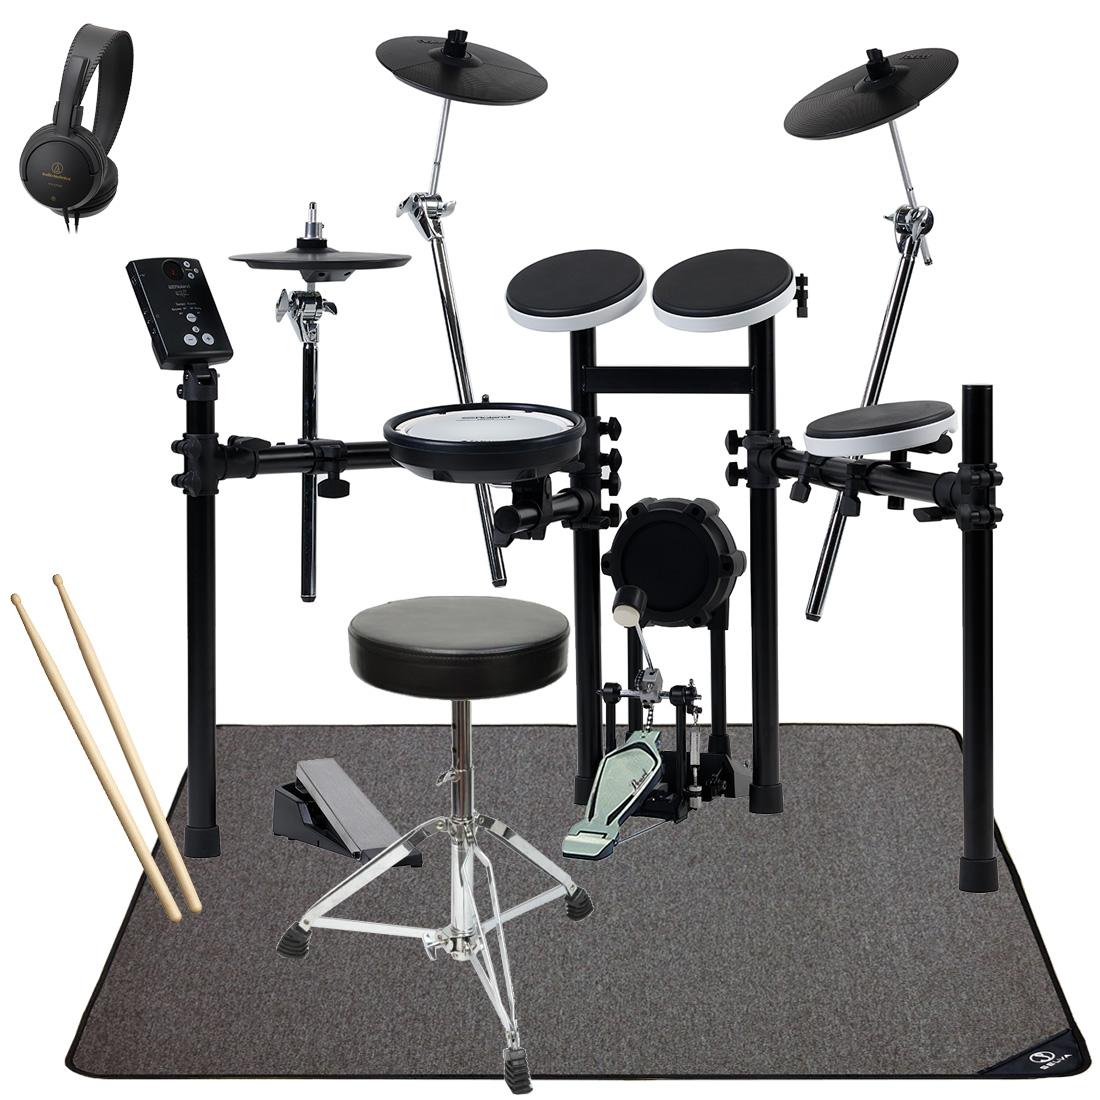 【Rolandキャッシュバック3000円対象】Roland / TD-E1 ローランド 電子ドラム オリジナル・スターターパック マット付き【YRK】【BLKFRD】